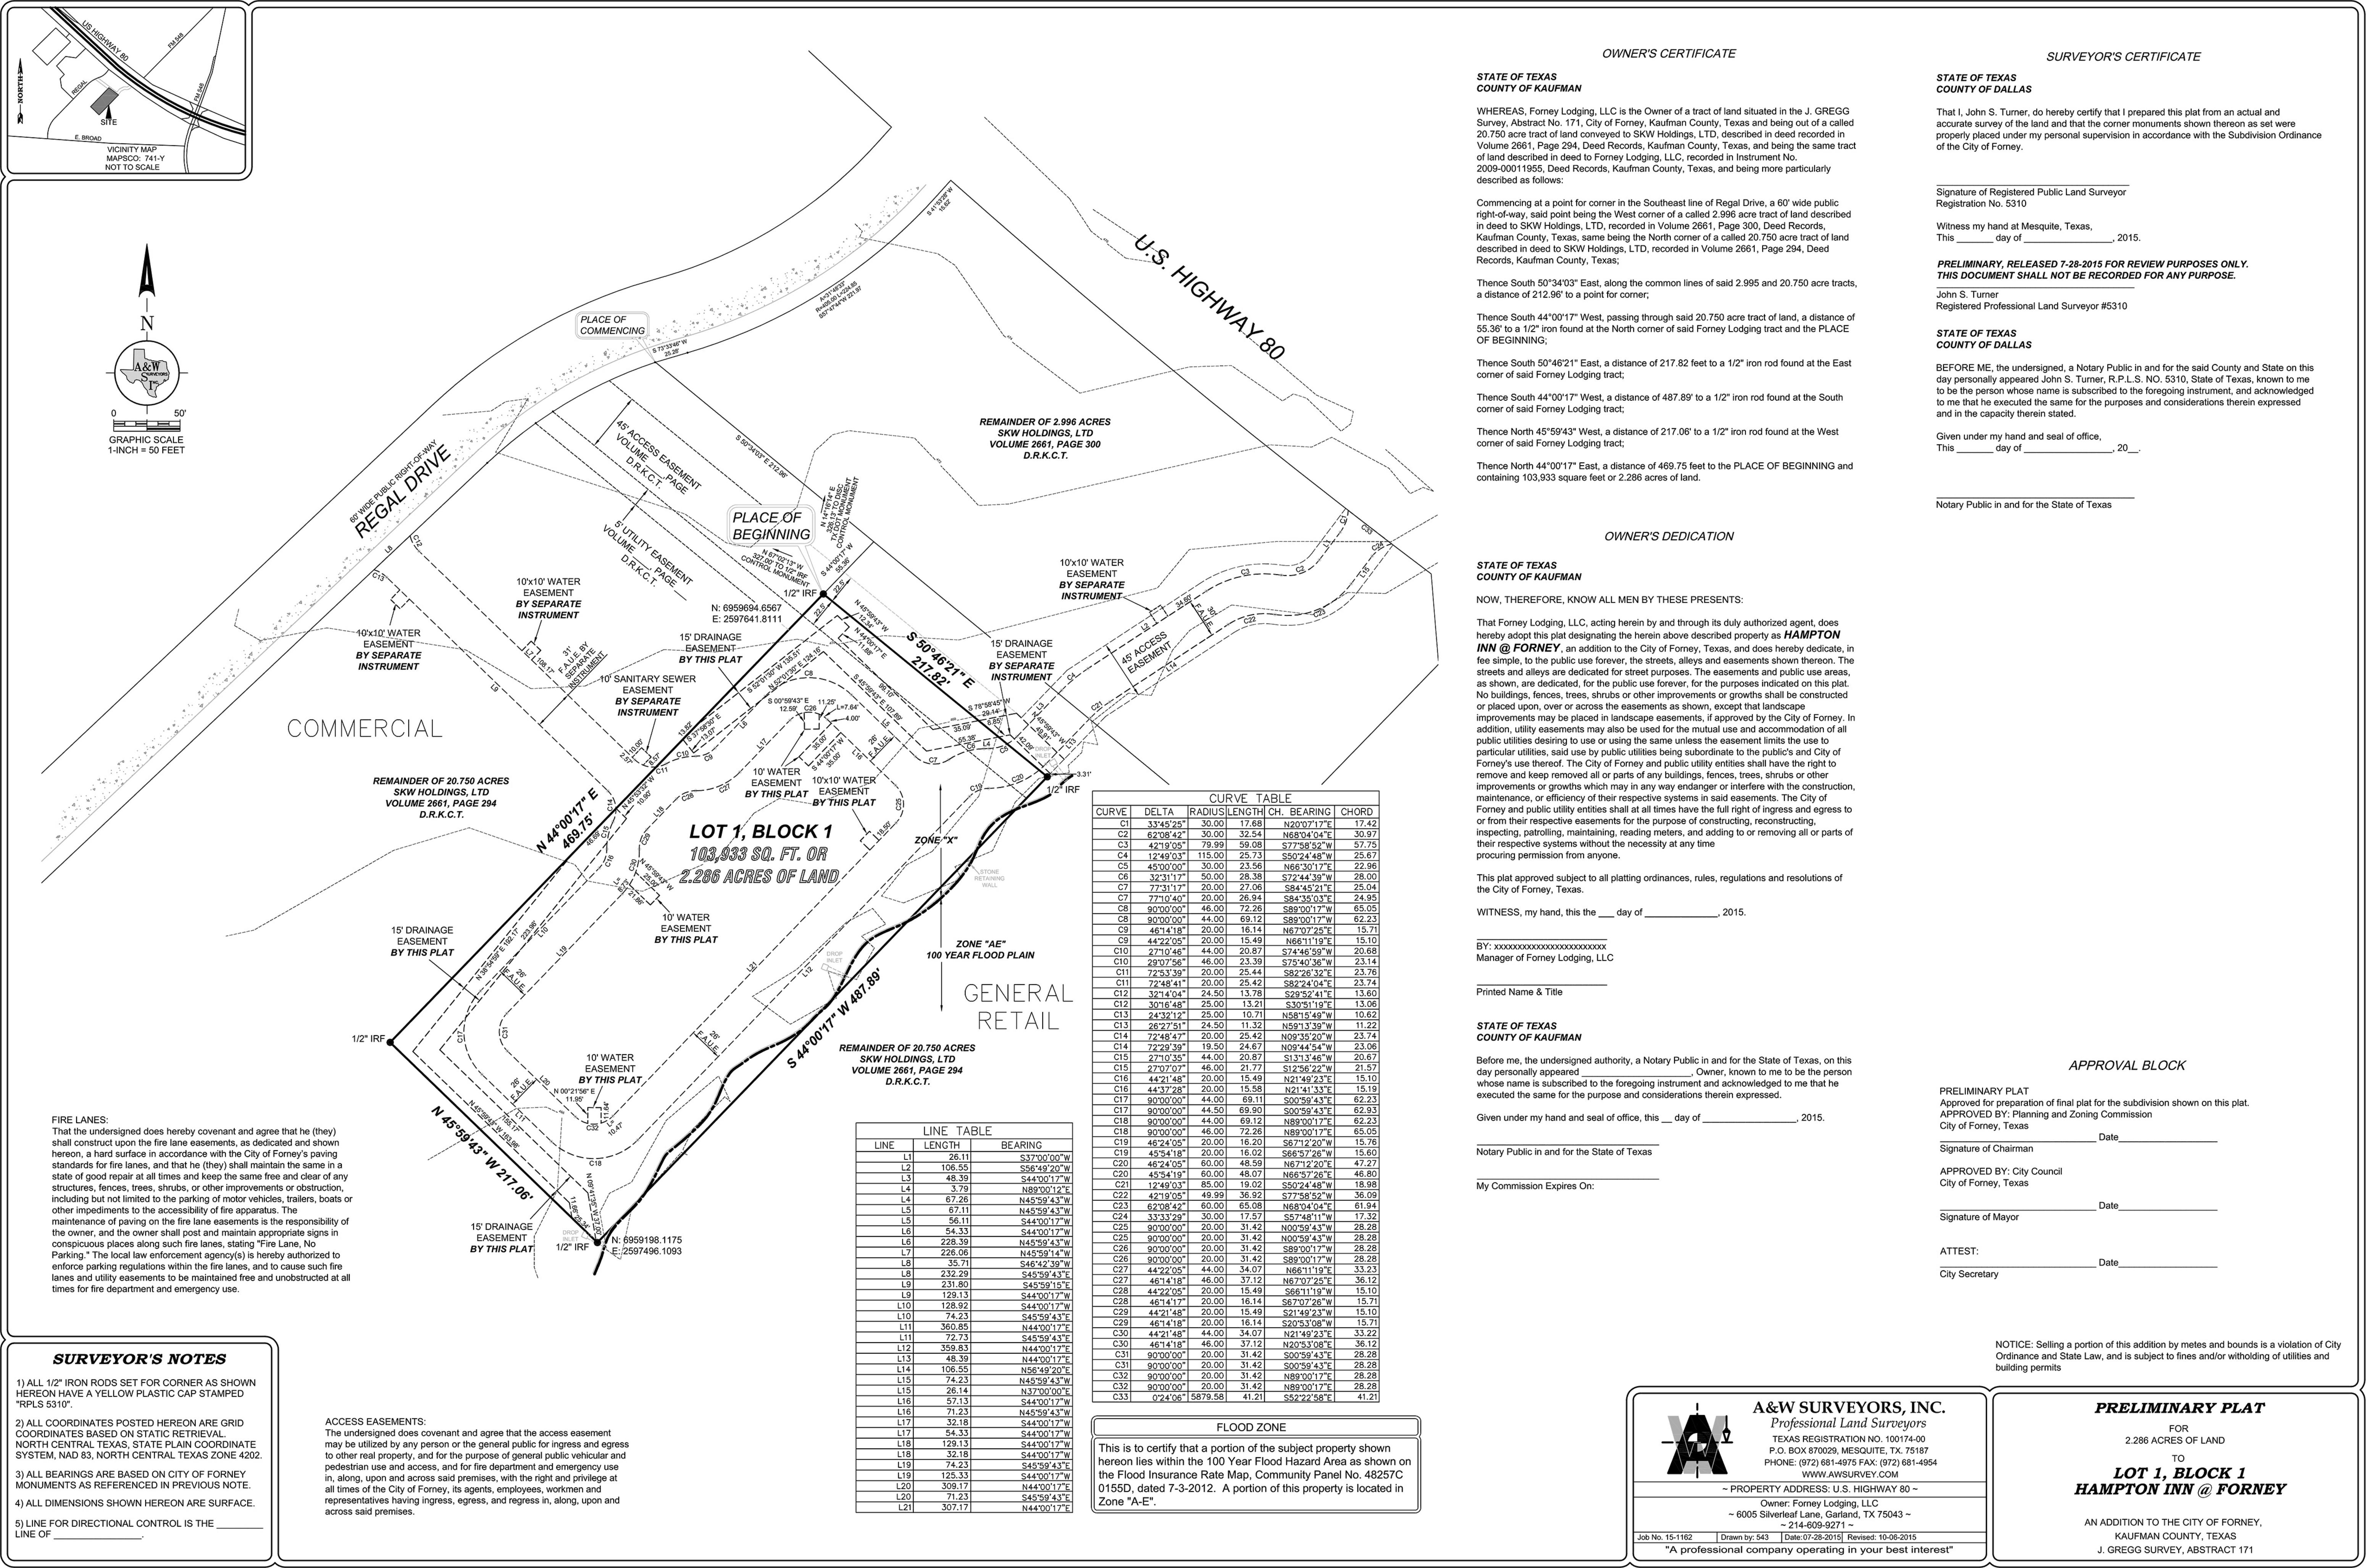 US Hwy 80 West of FM 548 at Regal - 2.39 ACRES: site plan